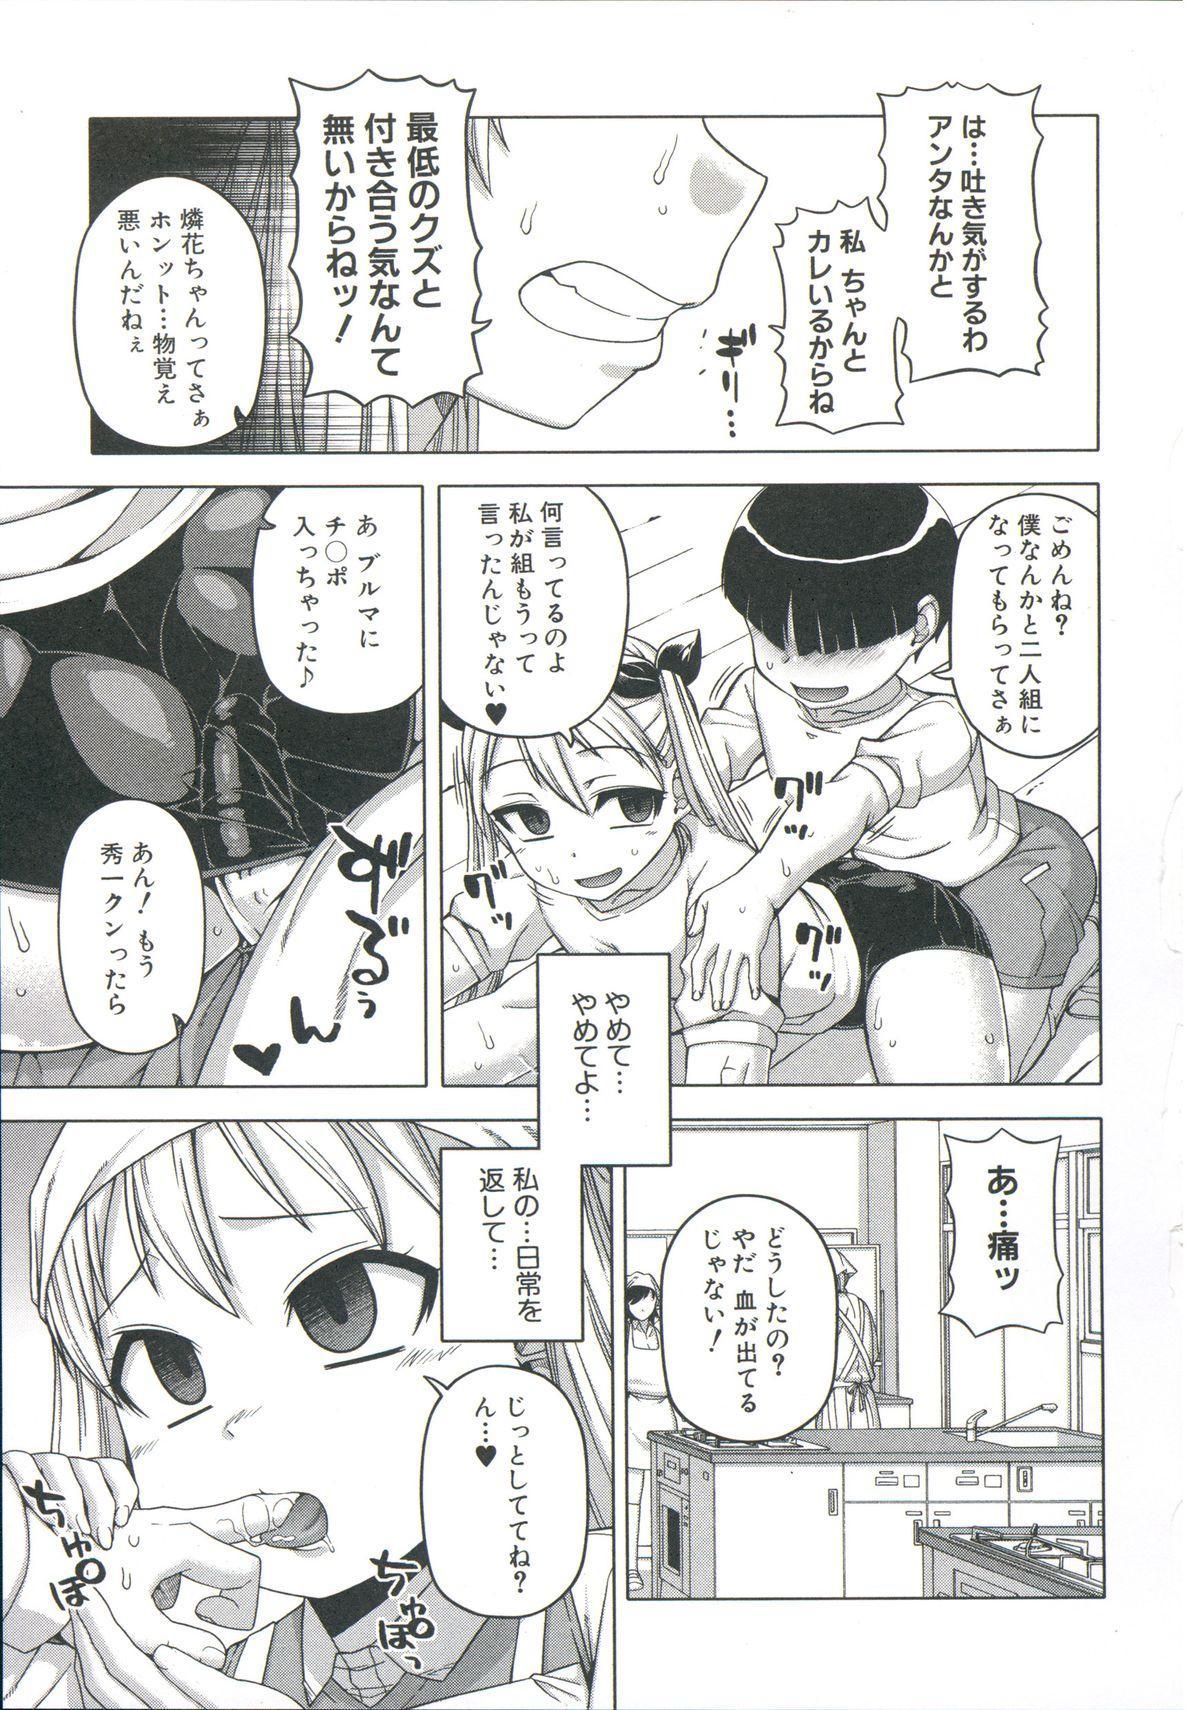 [Takatsu] Ou-sama Appli - King App 113